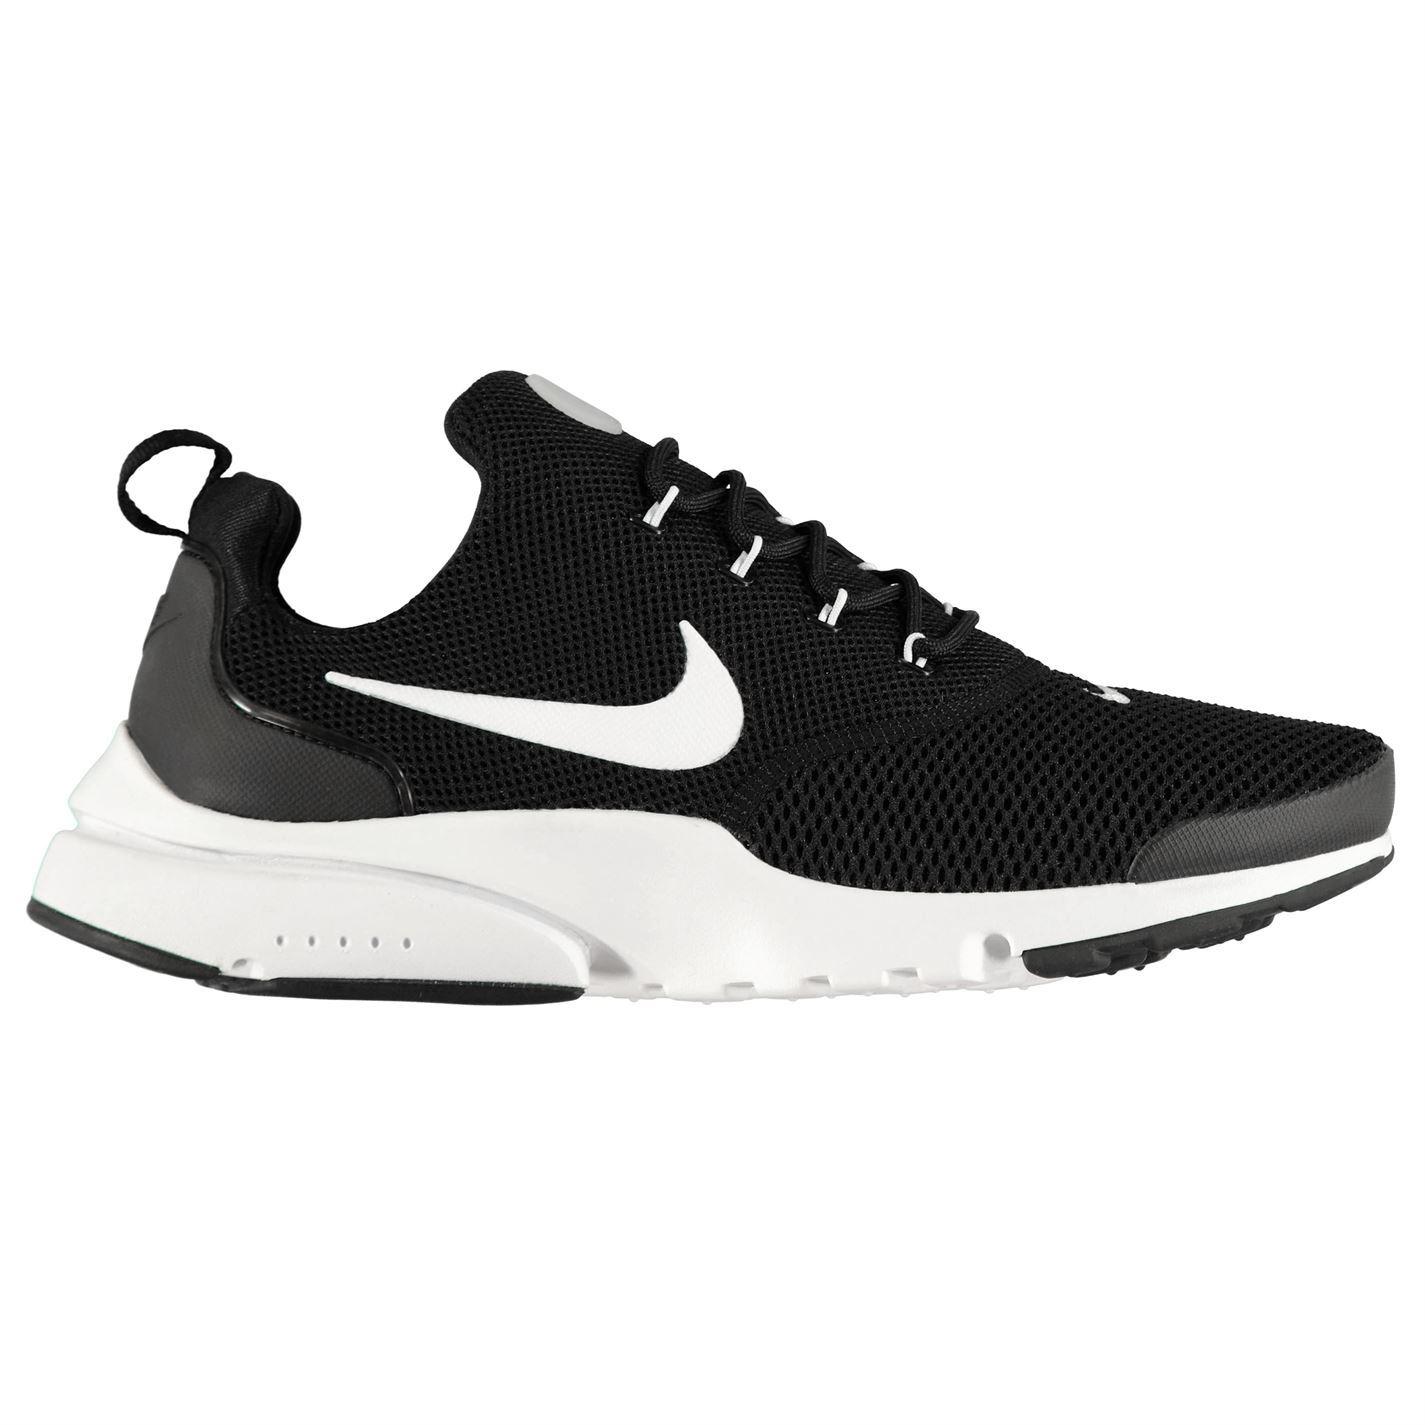 d8ff89f2ee9b Nike Presto Fly Trainers Mens Athleisure Footwear Shoes Sneakers